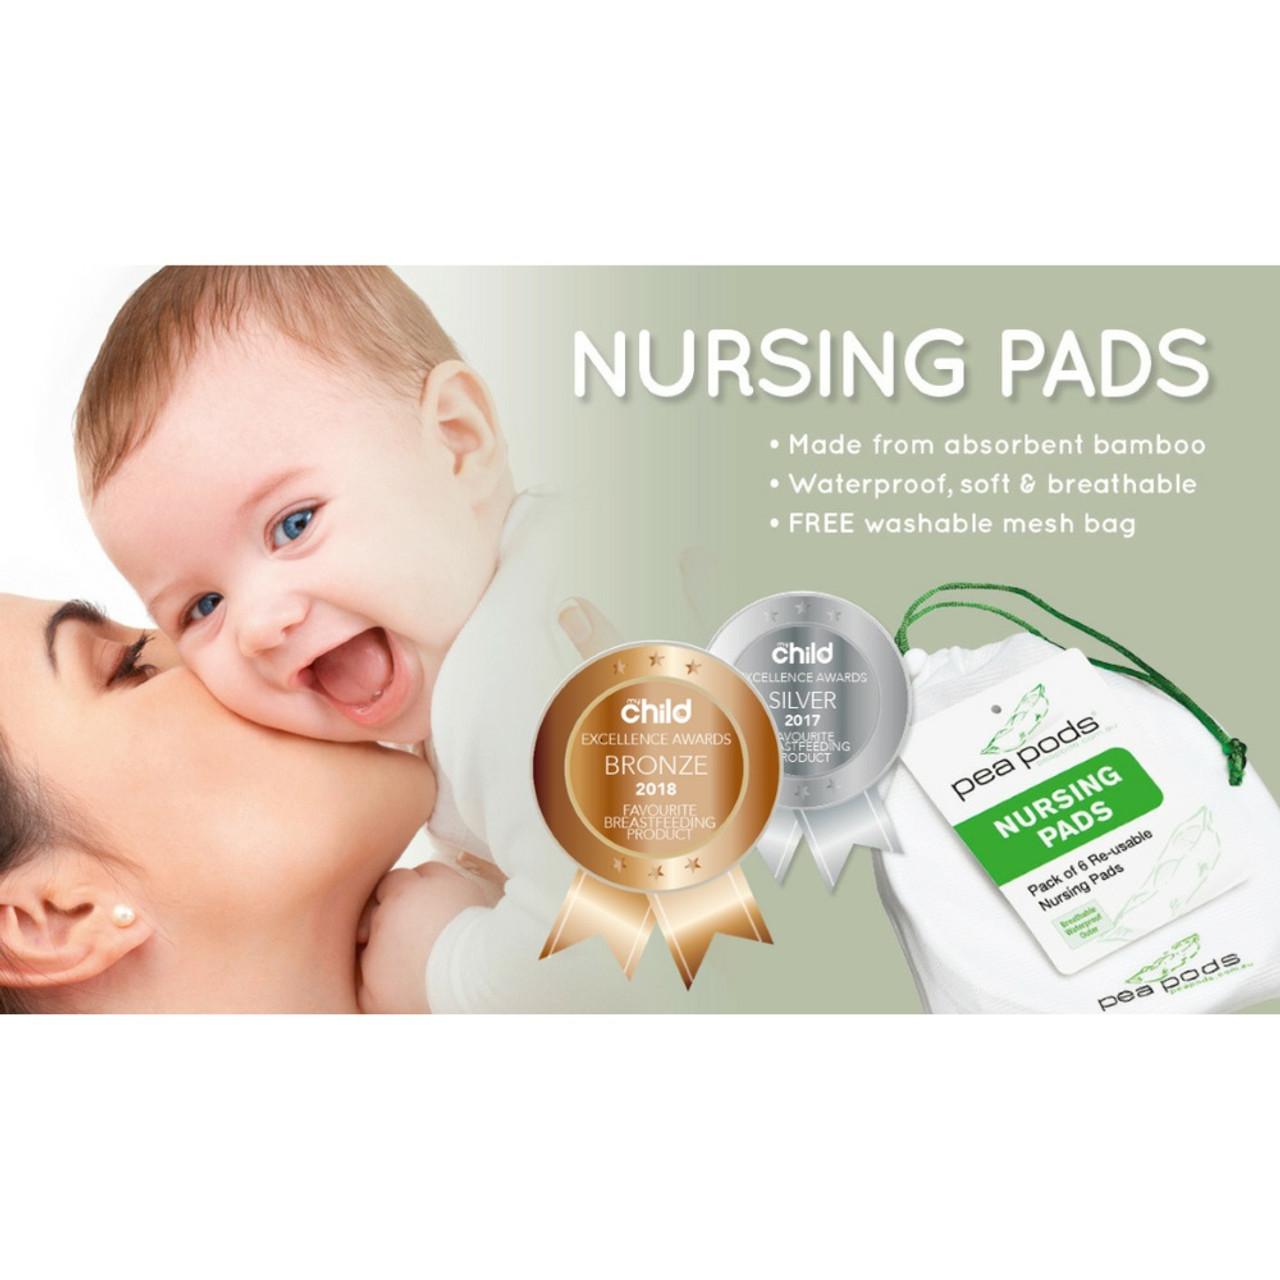 Pea Pods Reusable Nursing Pads